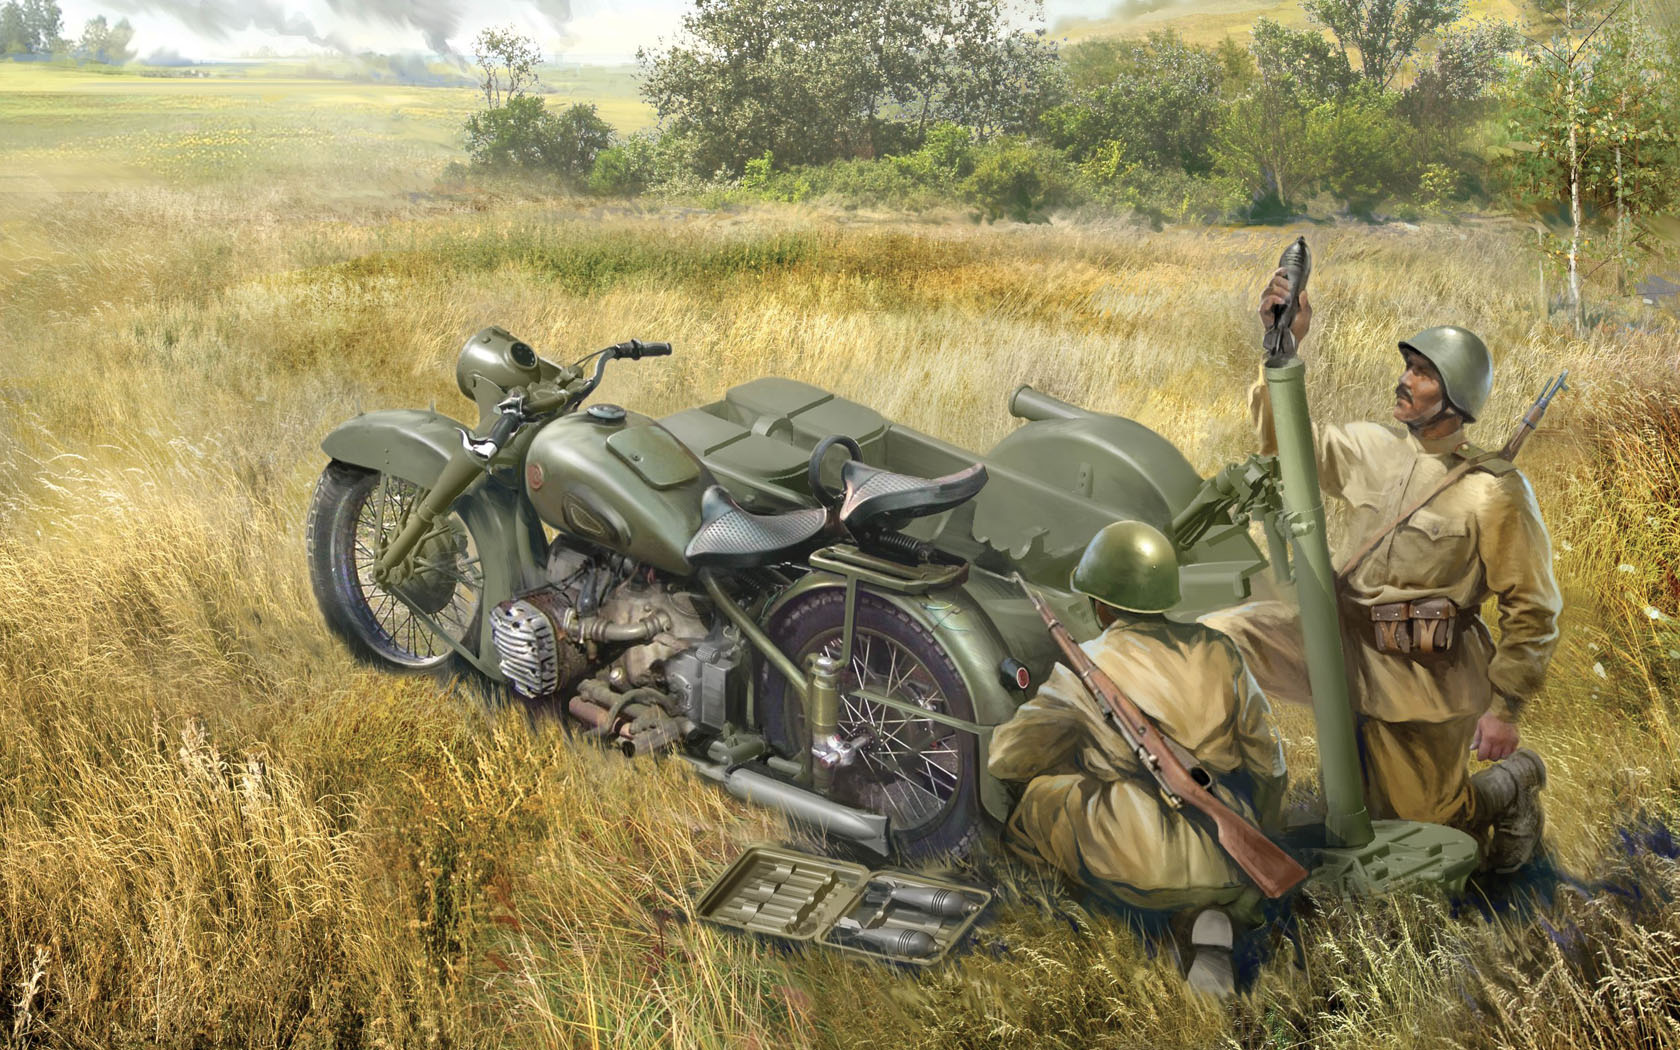 http://warwall.ru/Arts/12/Wallpaper_6302_AFV_M72.jpg